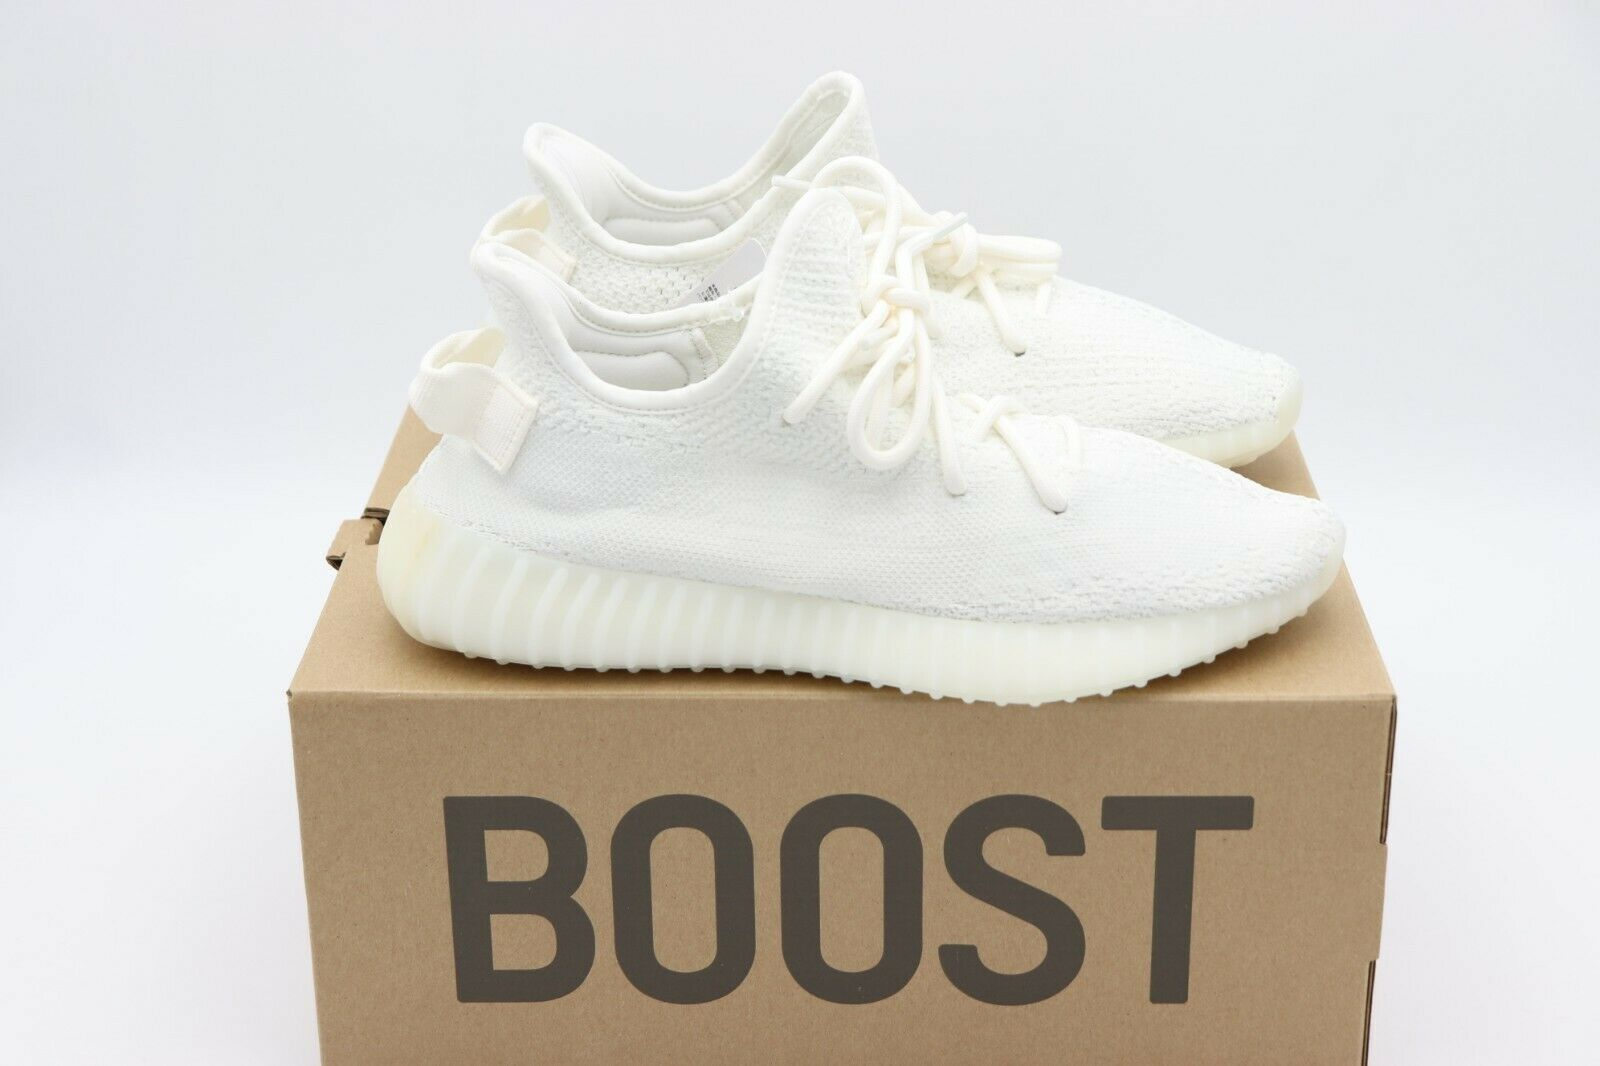 Neu in Box Adidas Yeezy Boost 350 V2 Triple Weiß Neu Größe 8 image 5